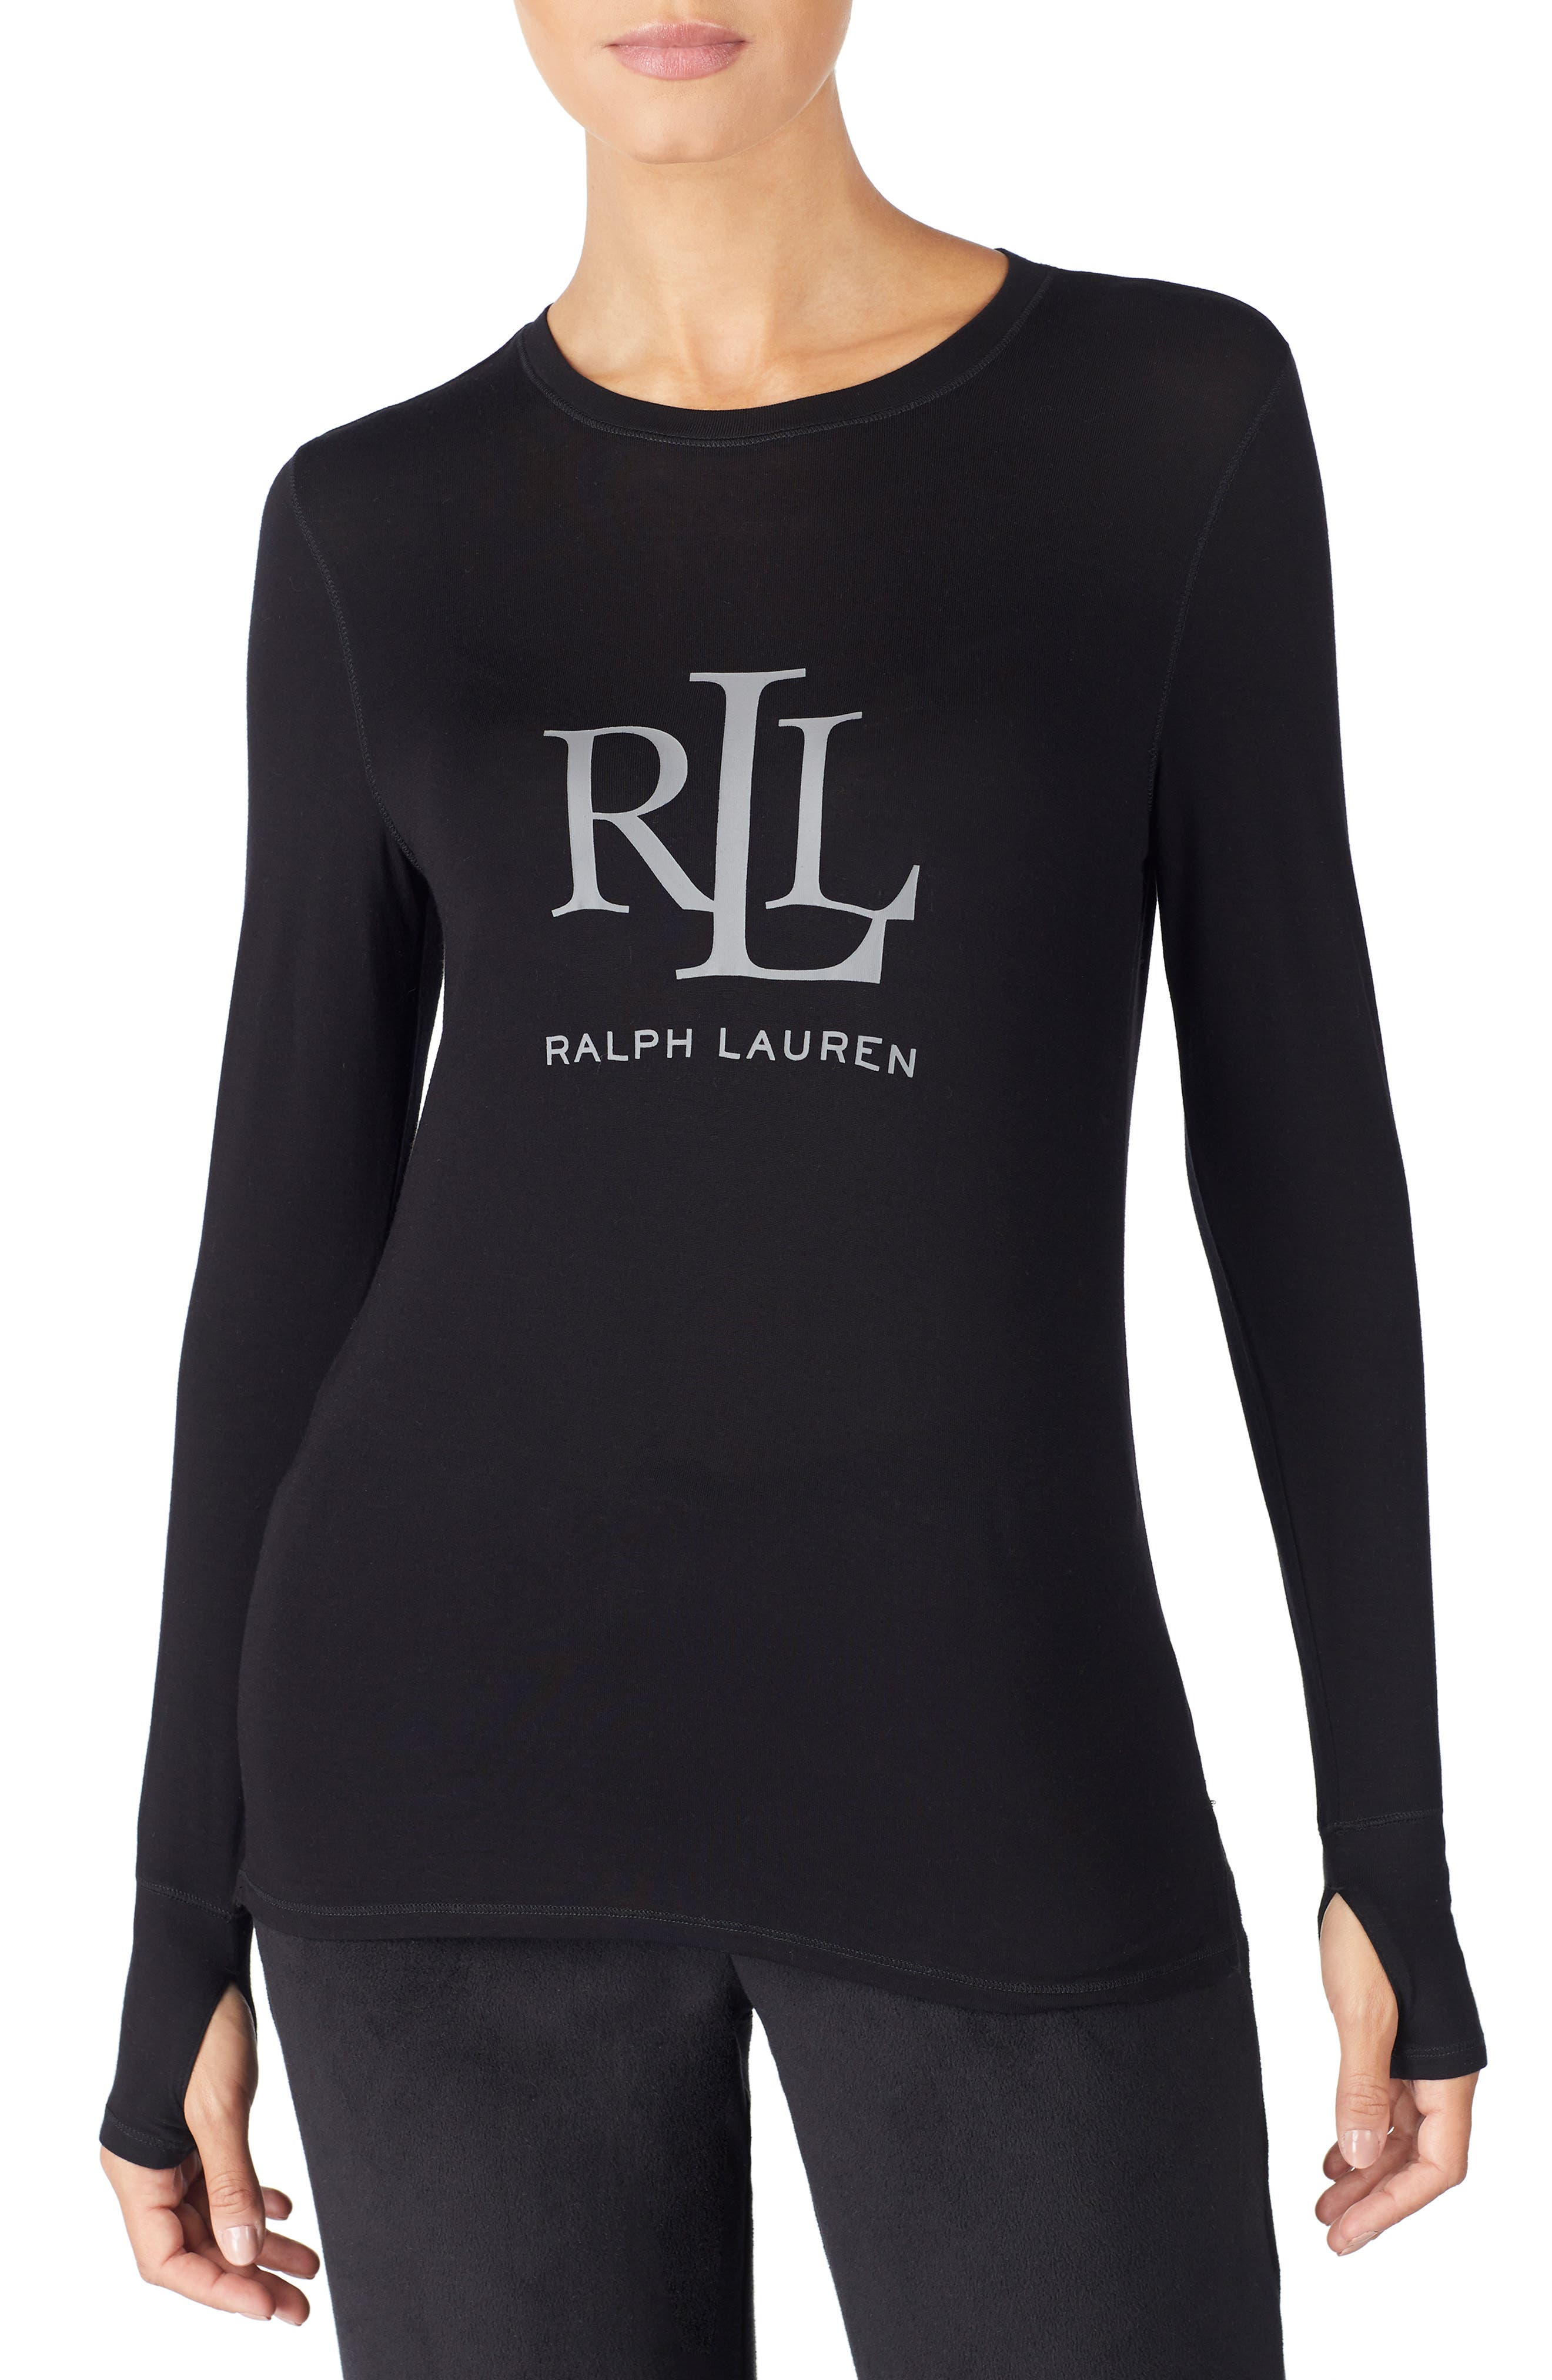 LAUREN RALPH LAUREN, Logo Graphic Lounge Tee, Main thumbnail 1, color, BLACK